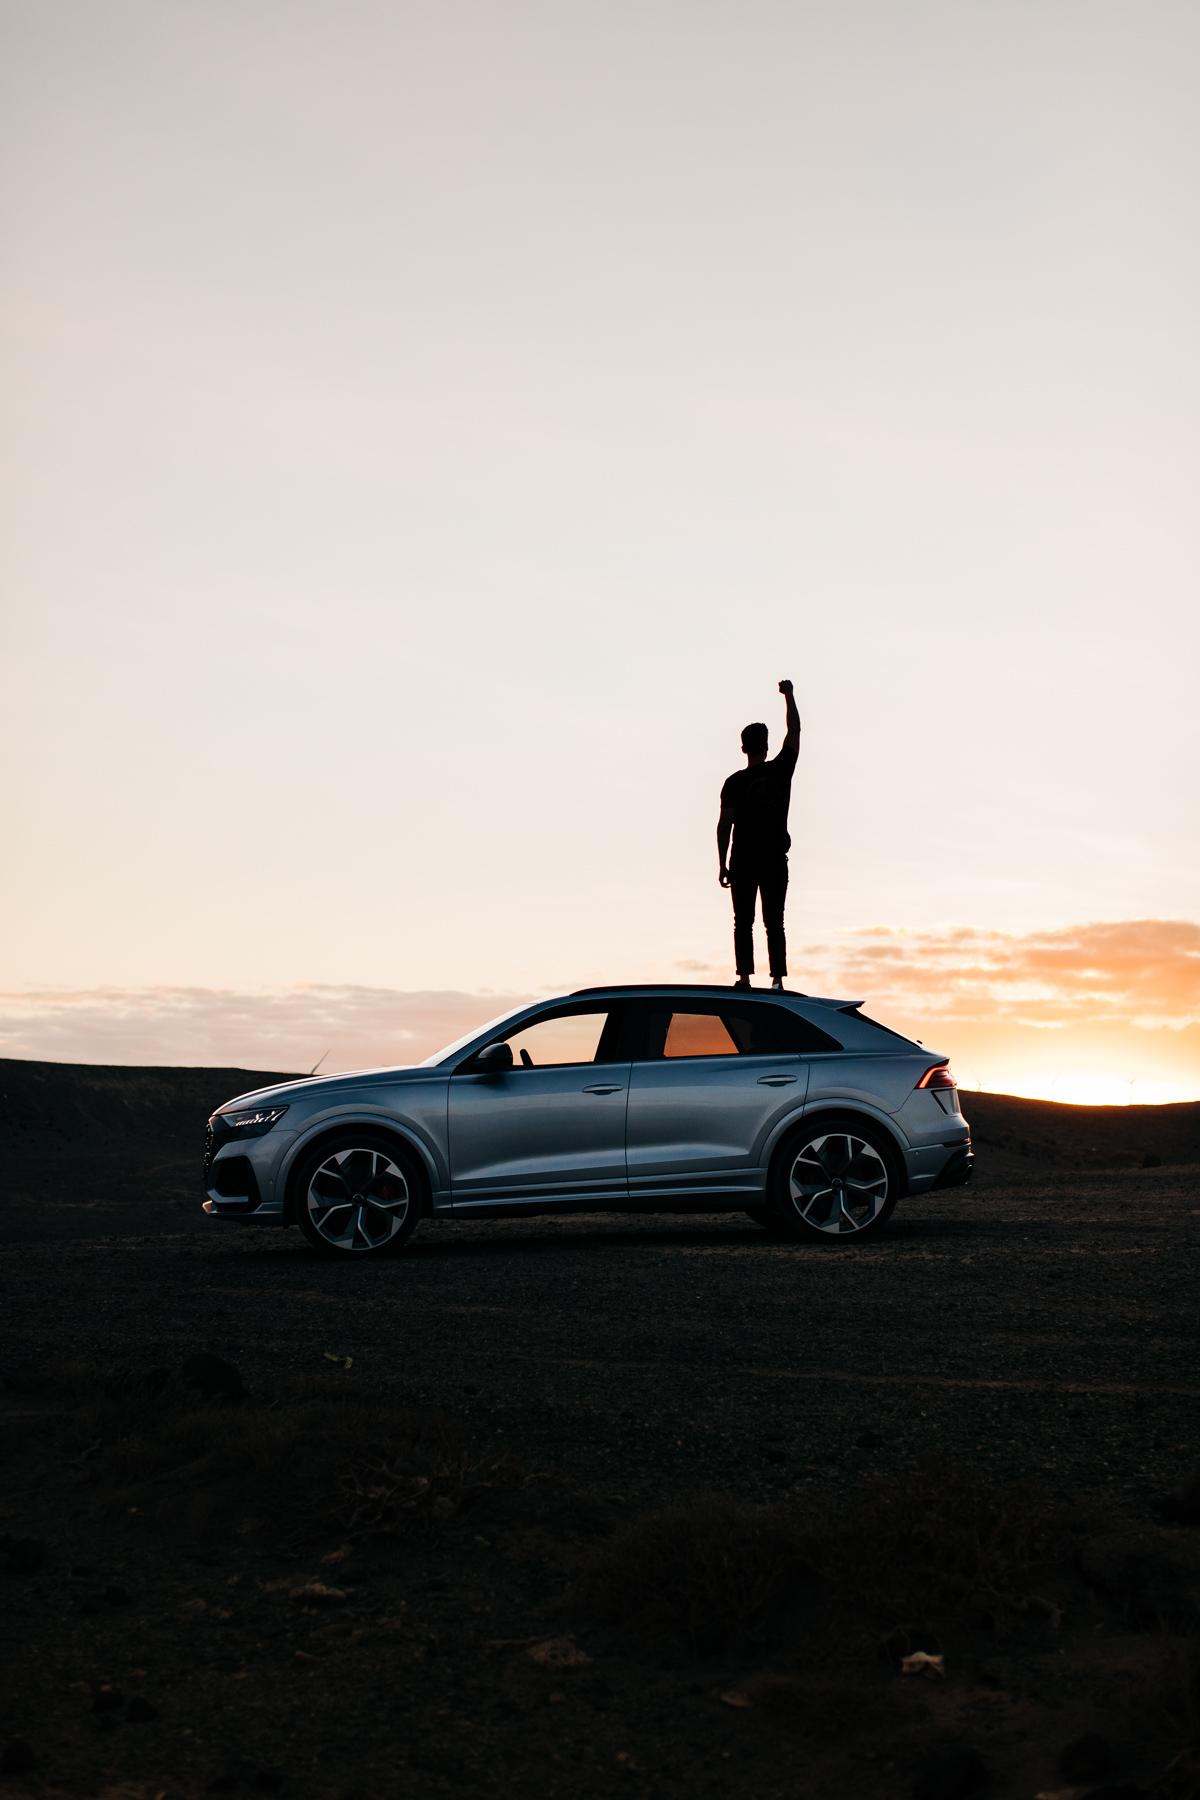 audi rsq8 sunset man power pose silhouette